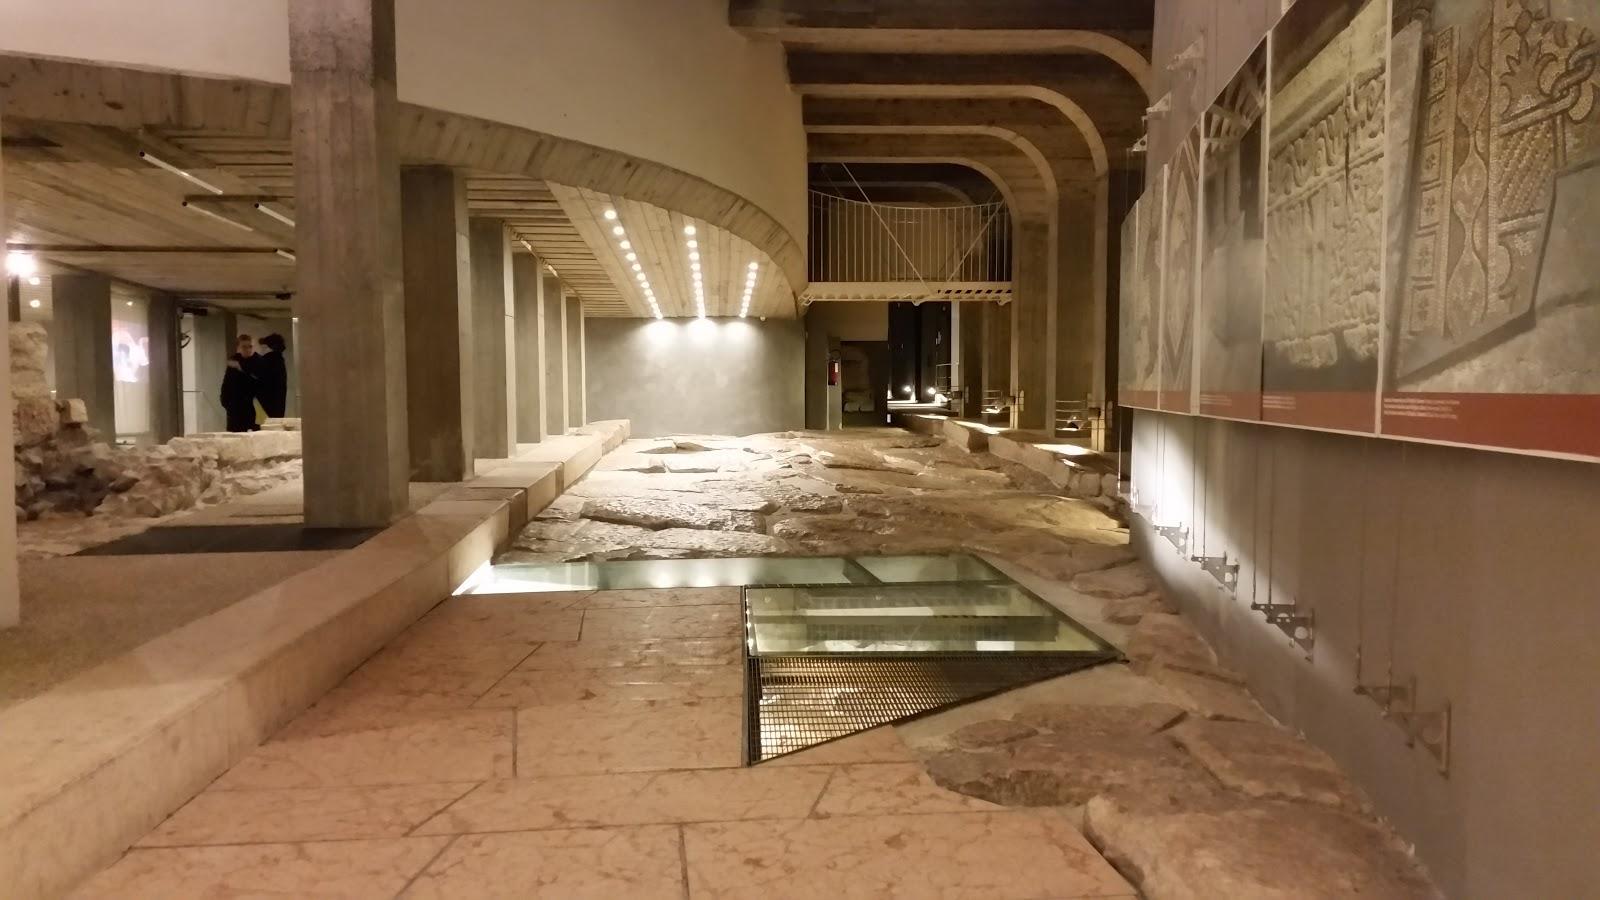 tridentum trento sotterranea - photo#4